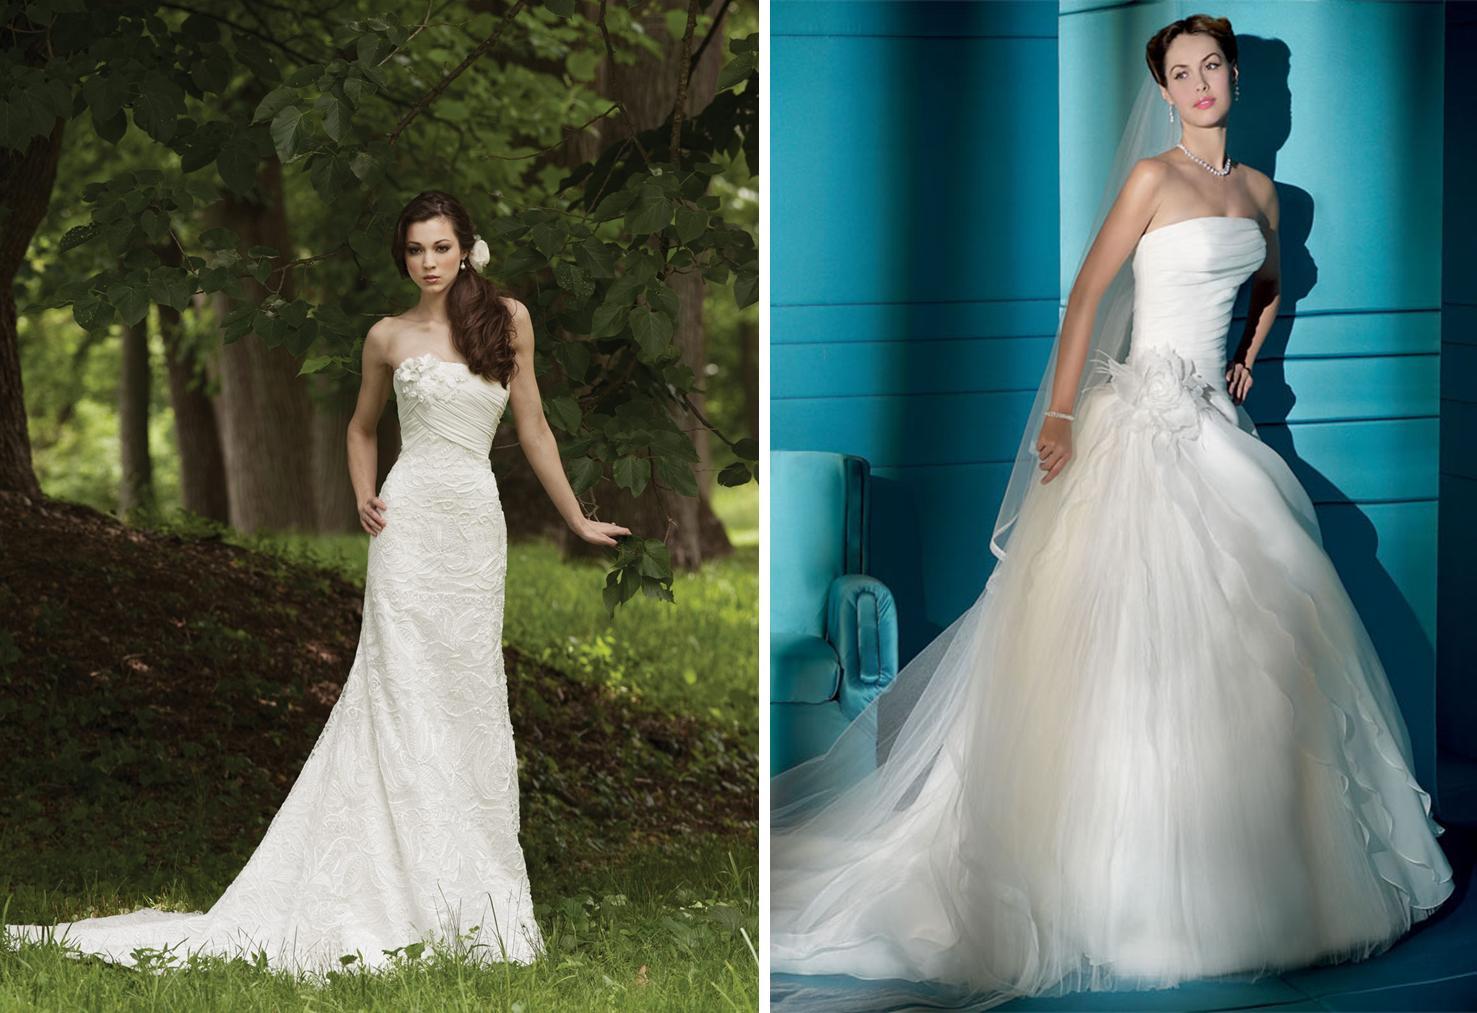 Wedding Dresses Ireland - Wedding Dresses In Jax